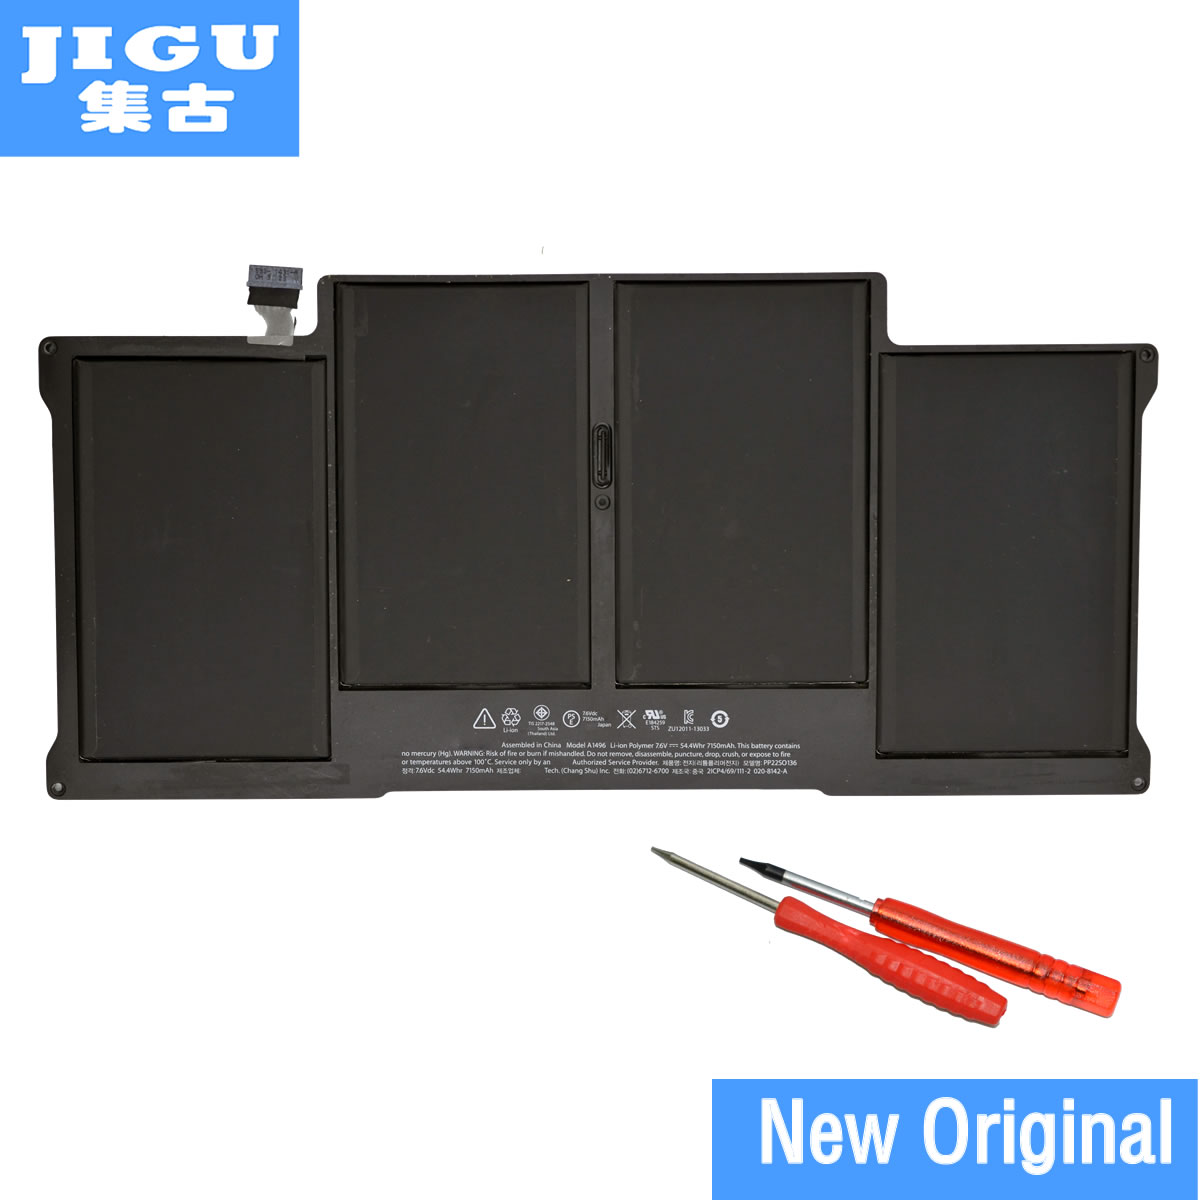 Jigu Бесплатная доставка A1496 оригинальный ноутбук Батарея для Apple MacBook Air 13 &#8220;<font><b>A1466</b></font> 2013/2014 md760ll/md761ch /7.6 В 7150 мАч